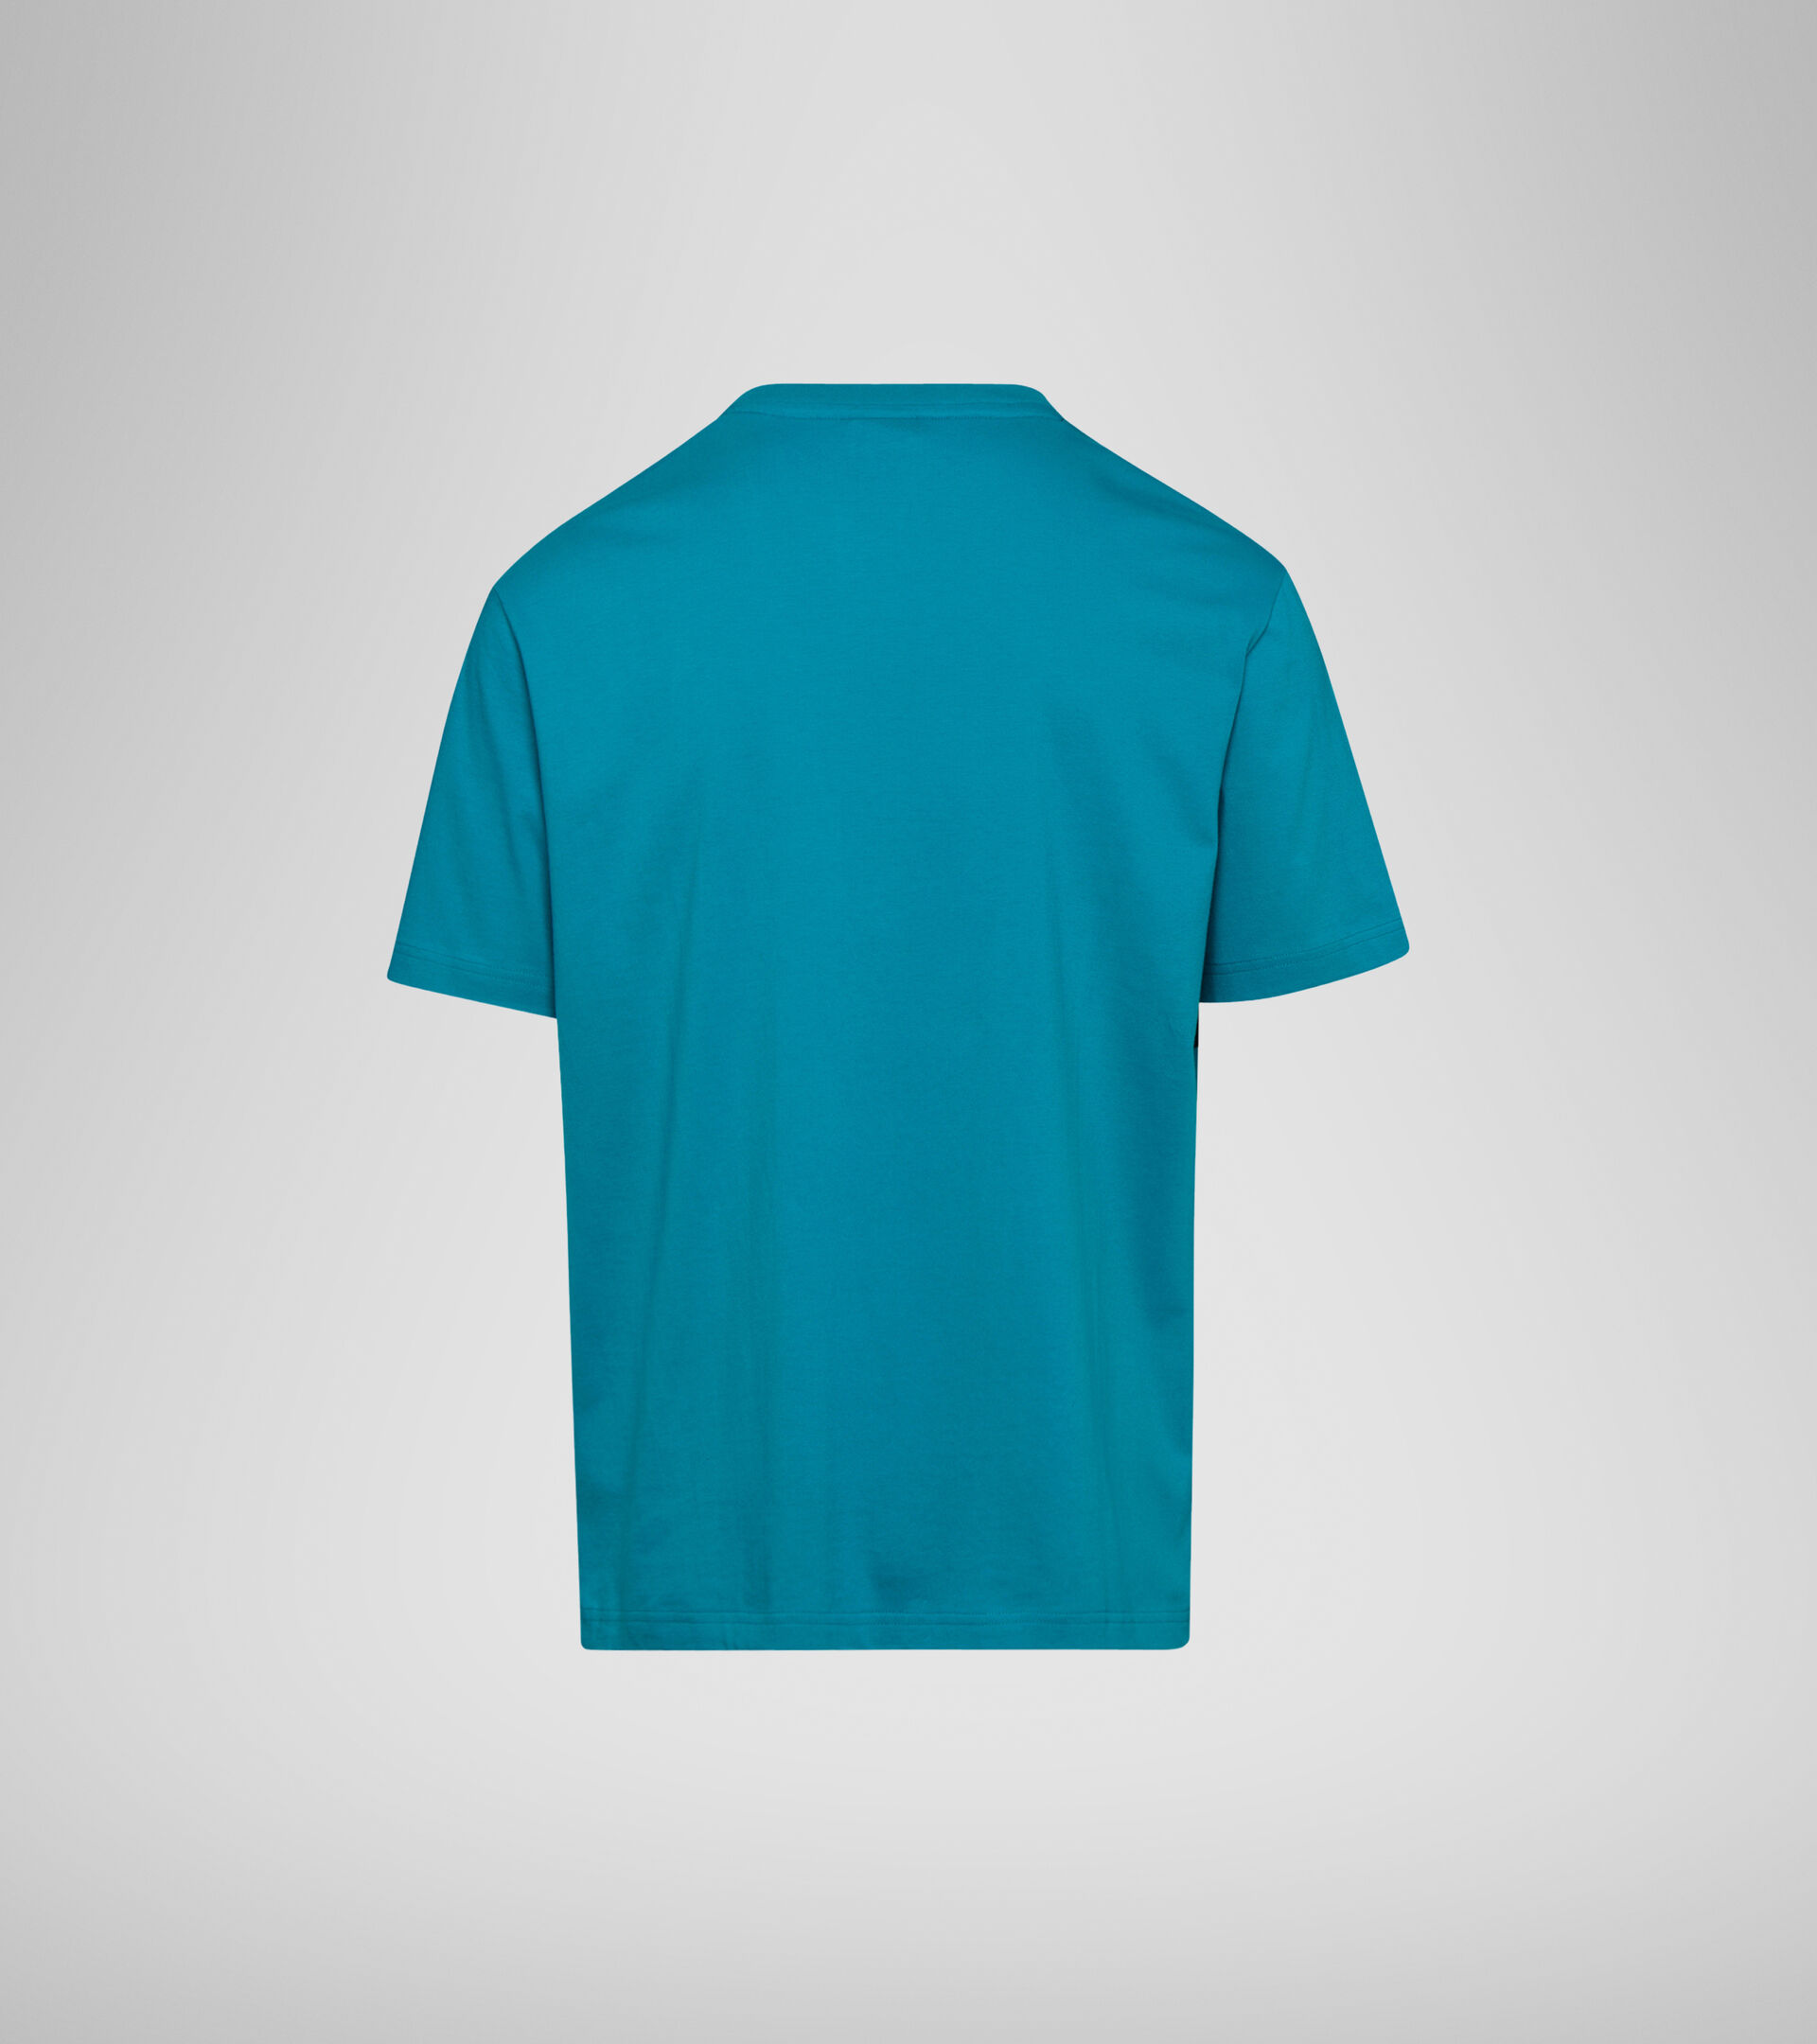 Apparel Sportswear UOMO T-SHIRT SS ICON STELLA ACQUA GREEN Diadora